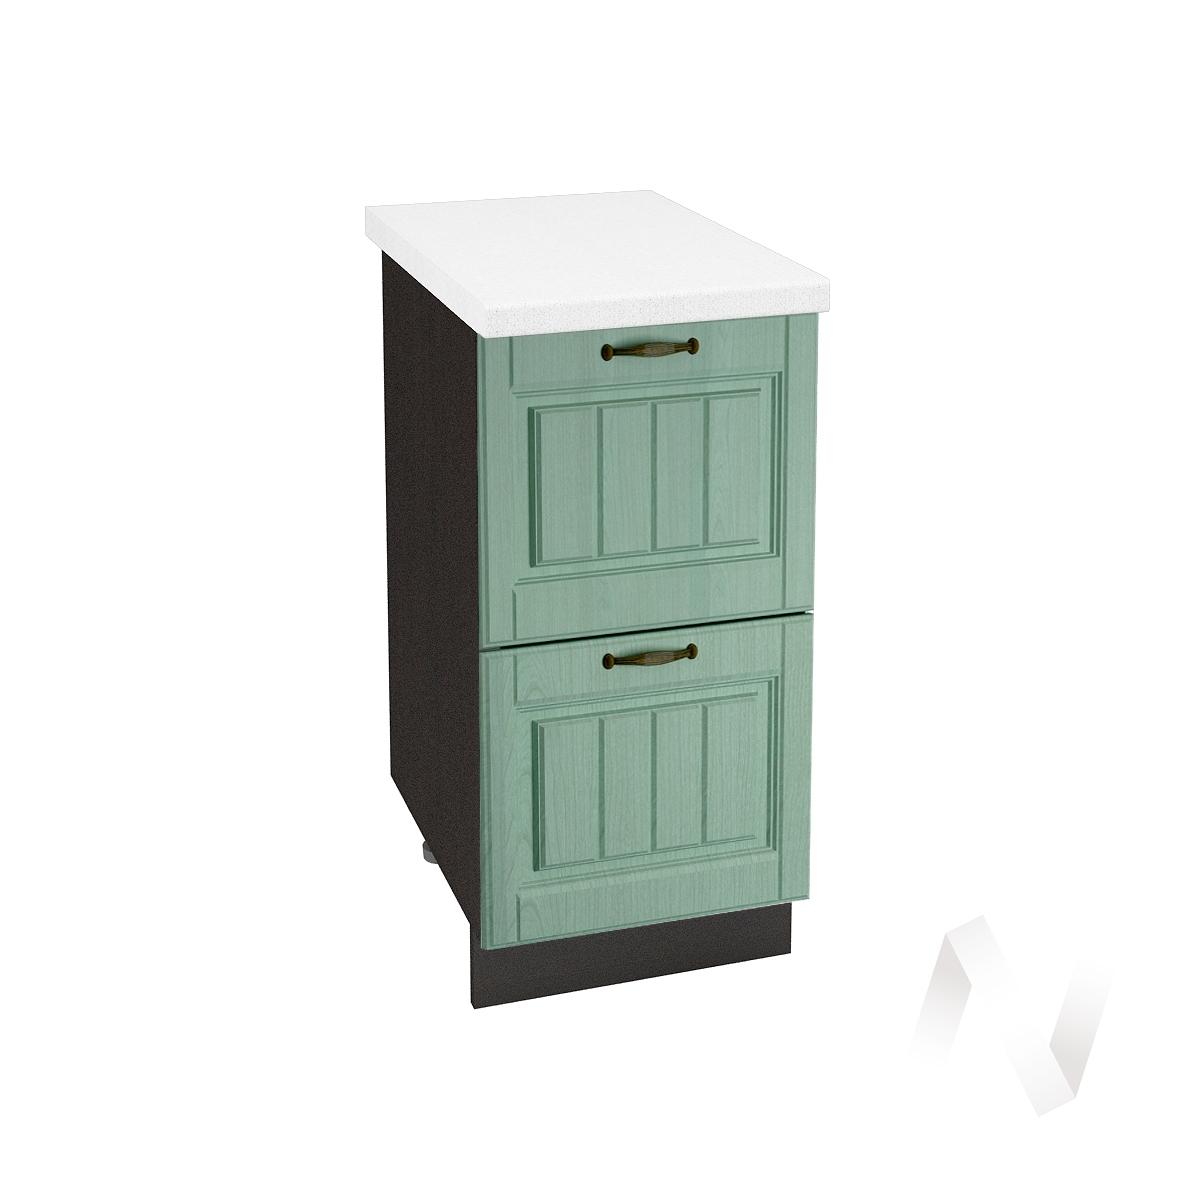 "Кухня ""Прованс"": Шкаф нижний с 2-мя ящиками 400, ШН2Я 400 (корпус венге)"